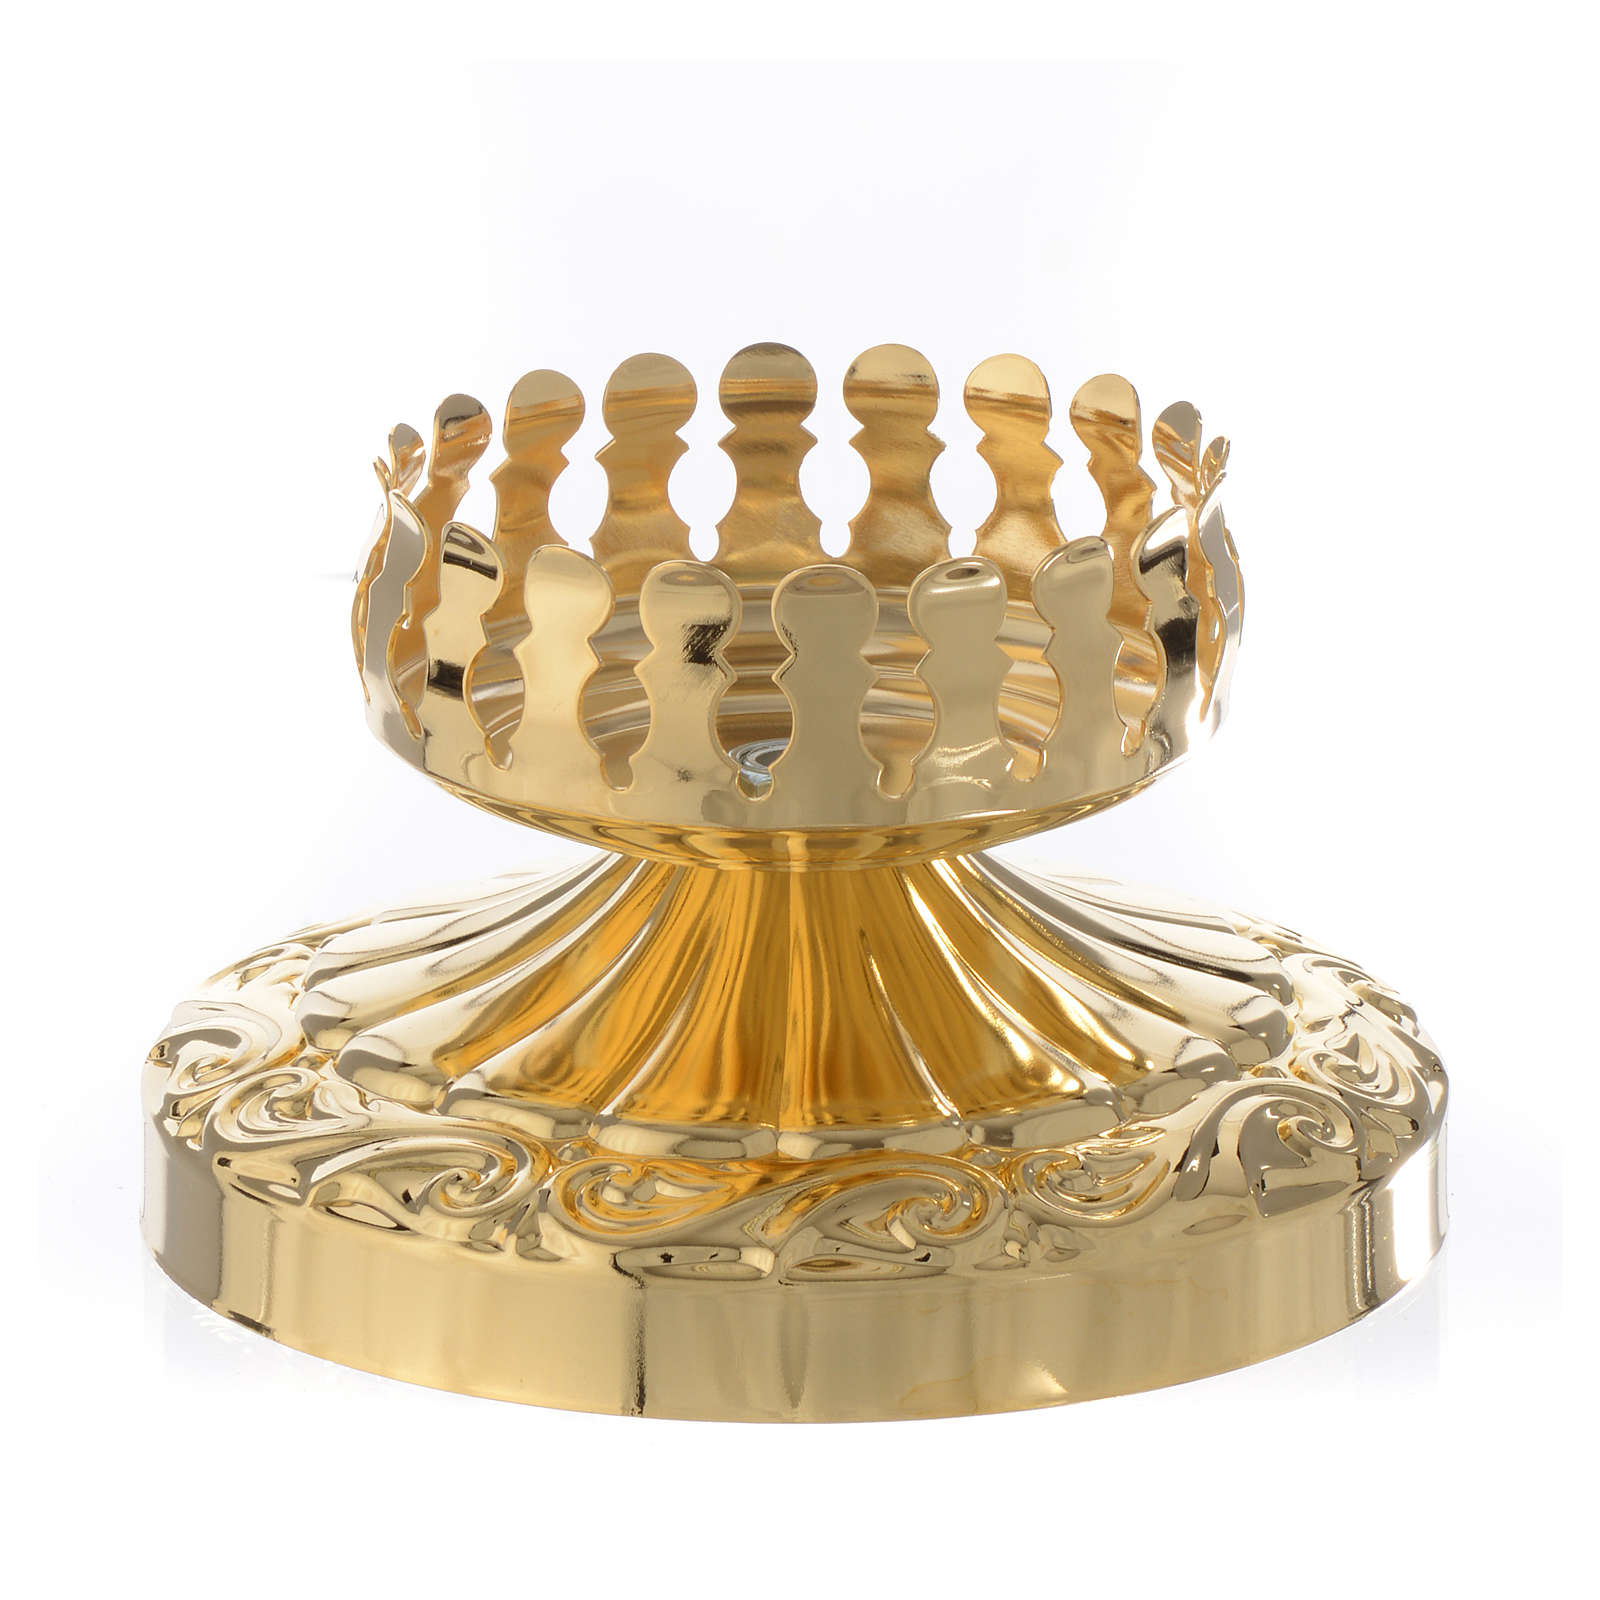 Lampada Santissimo per vetro stile impero 3